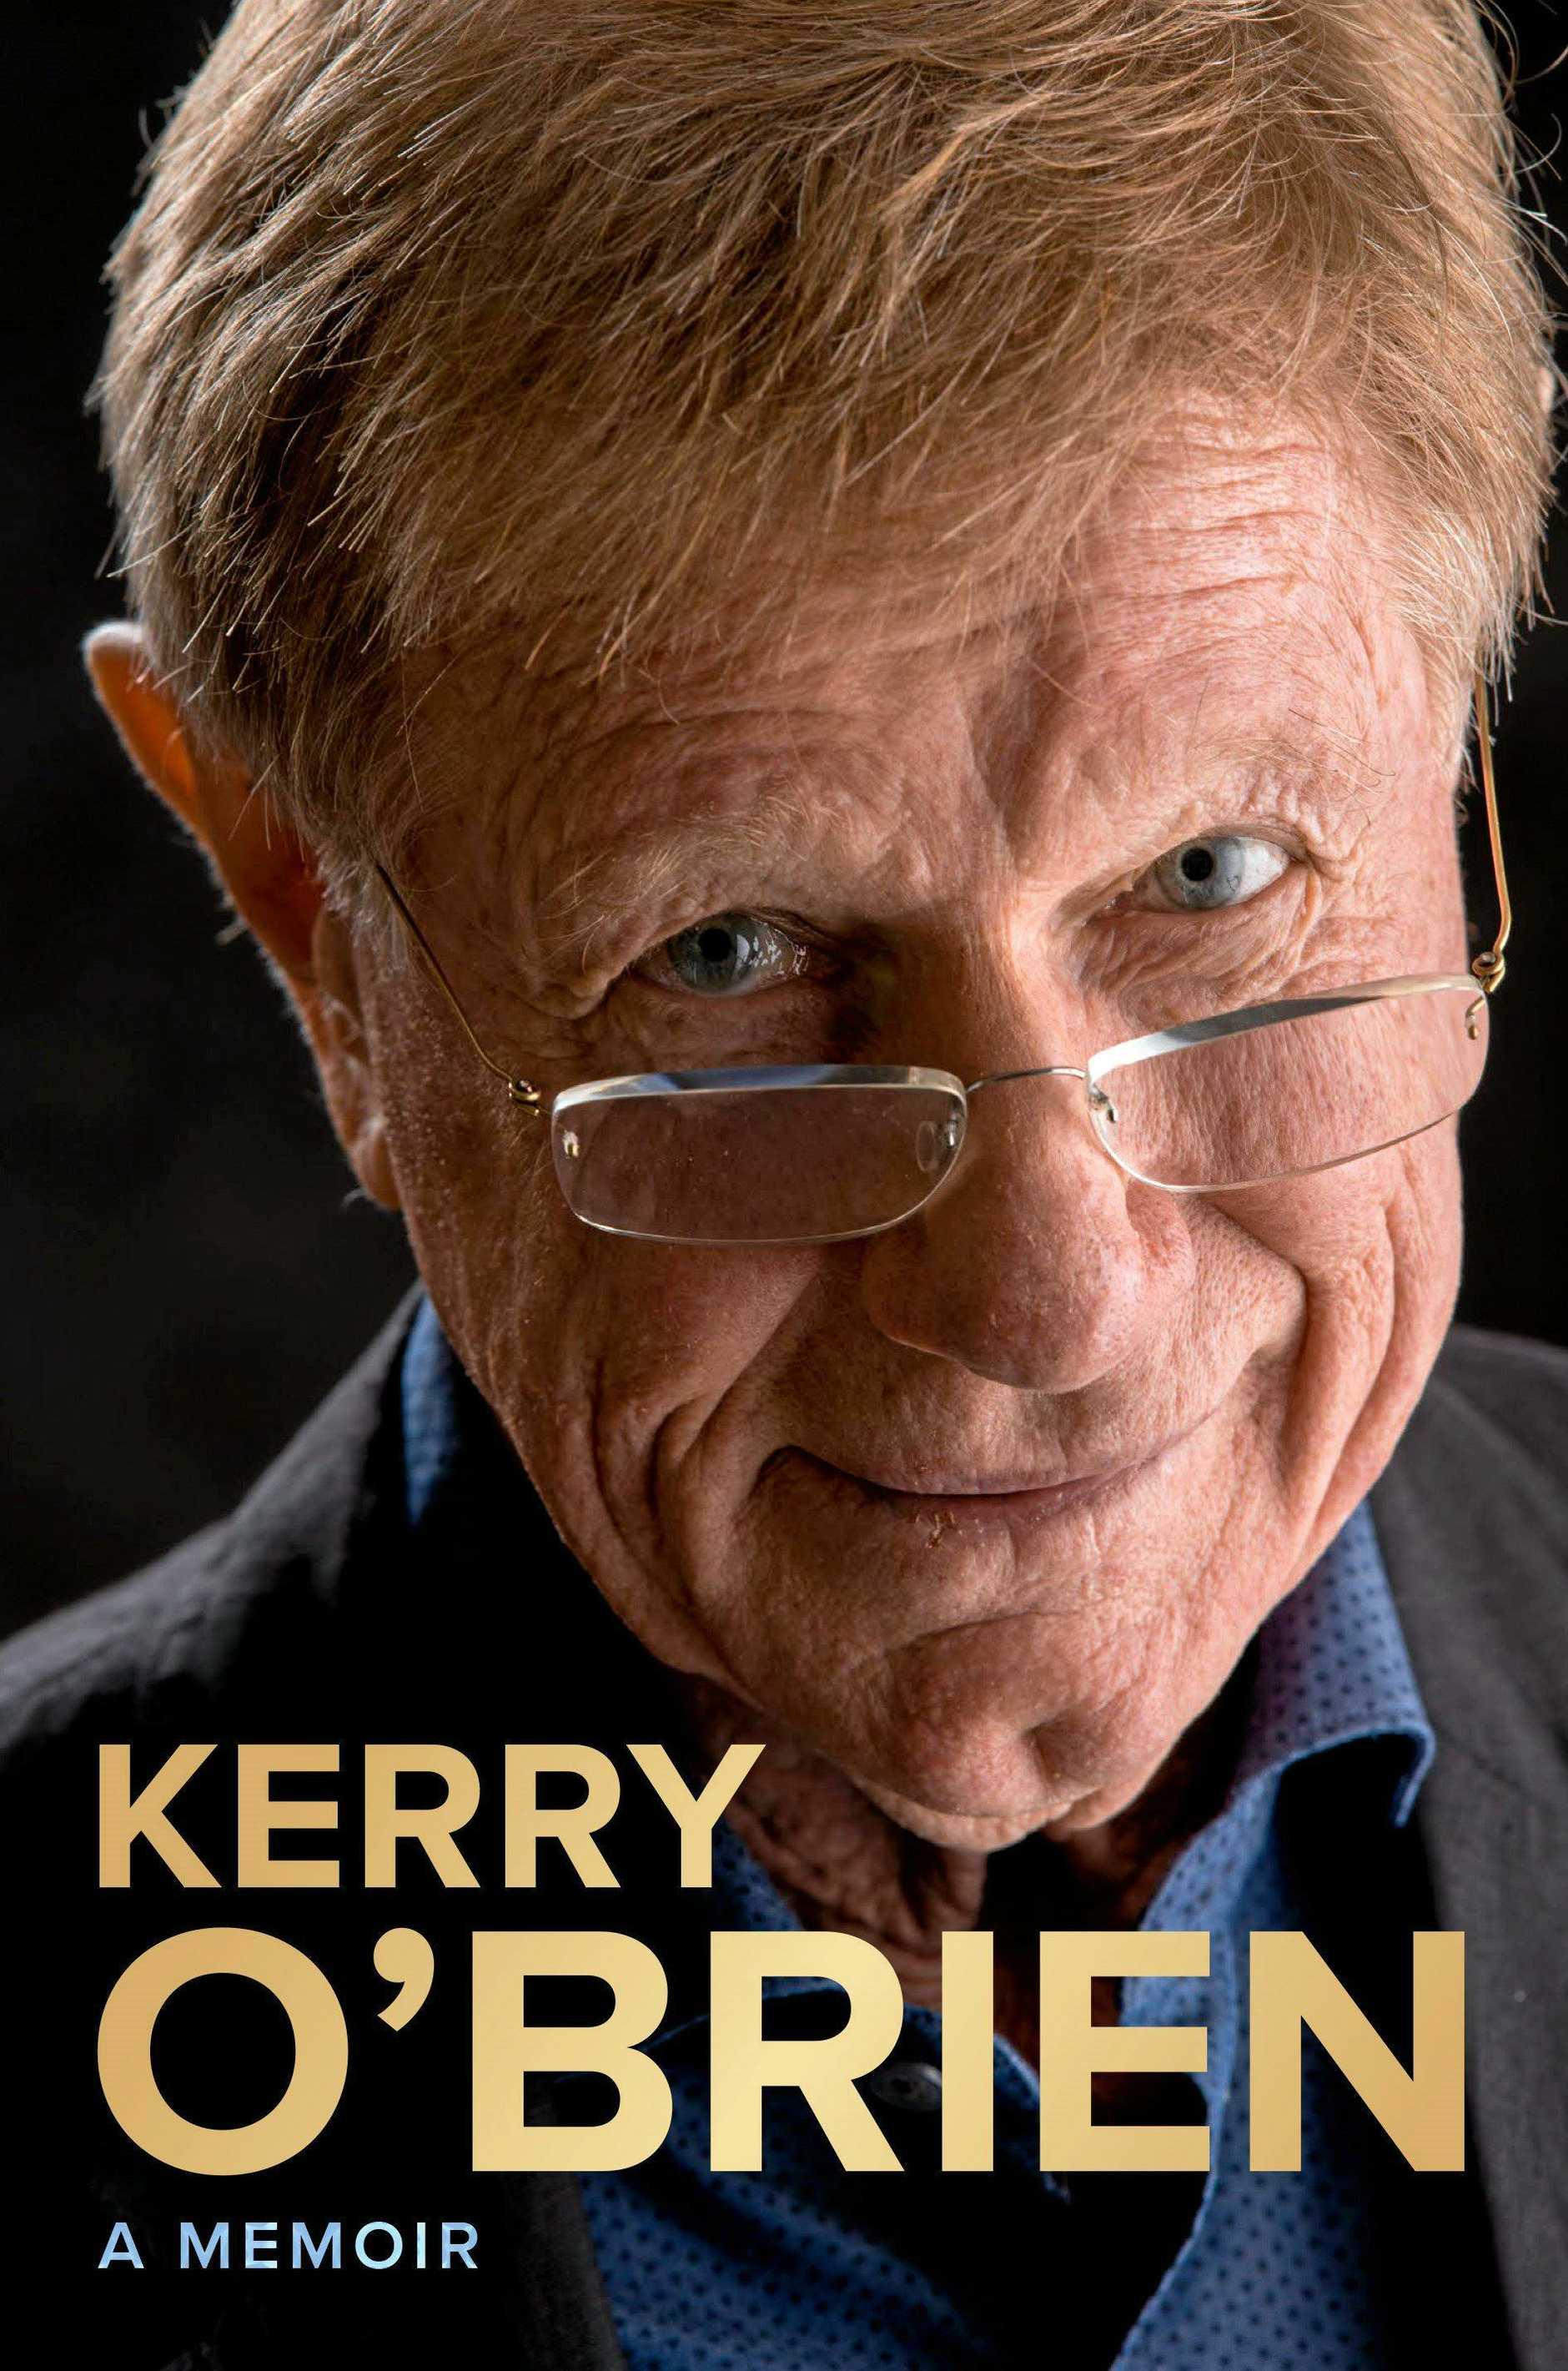 SUMMER READING: Veteran journalist Kerry O'Brien's memoir.